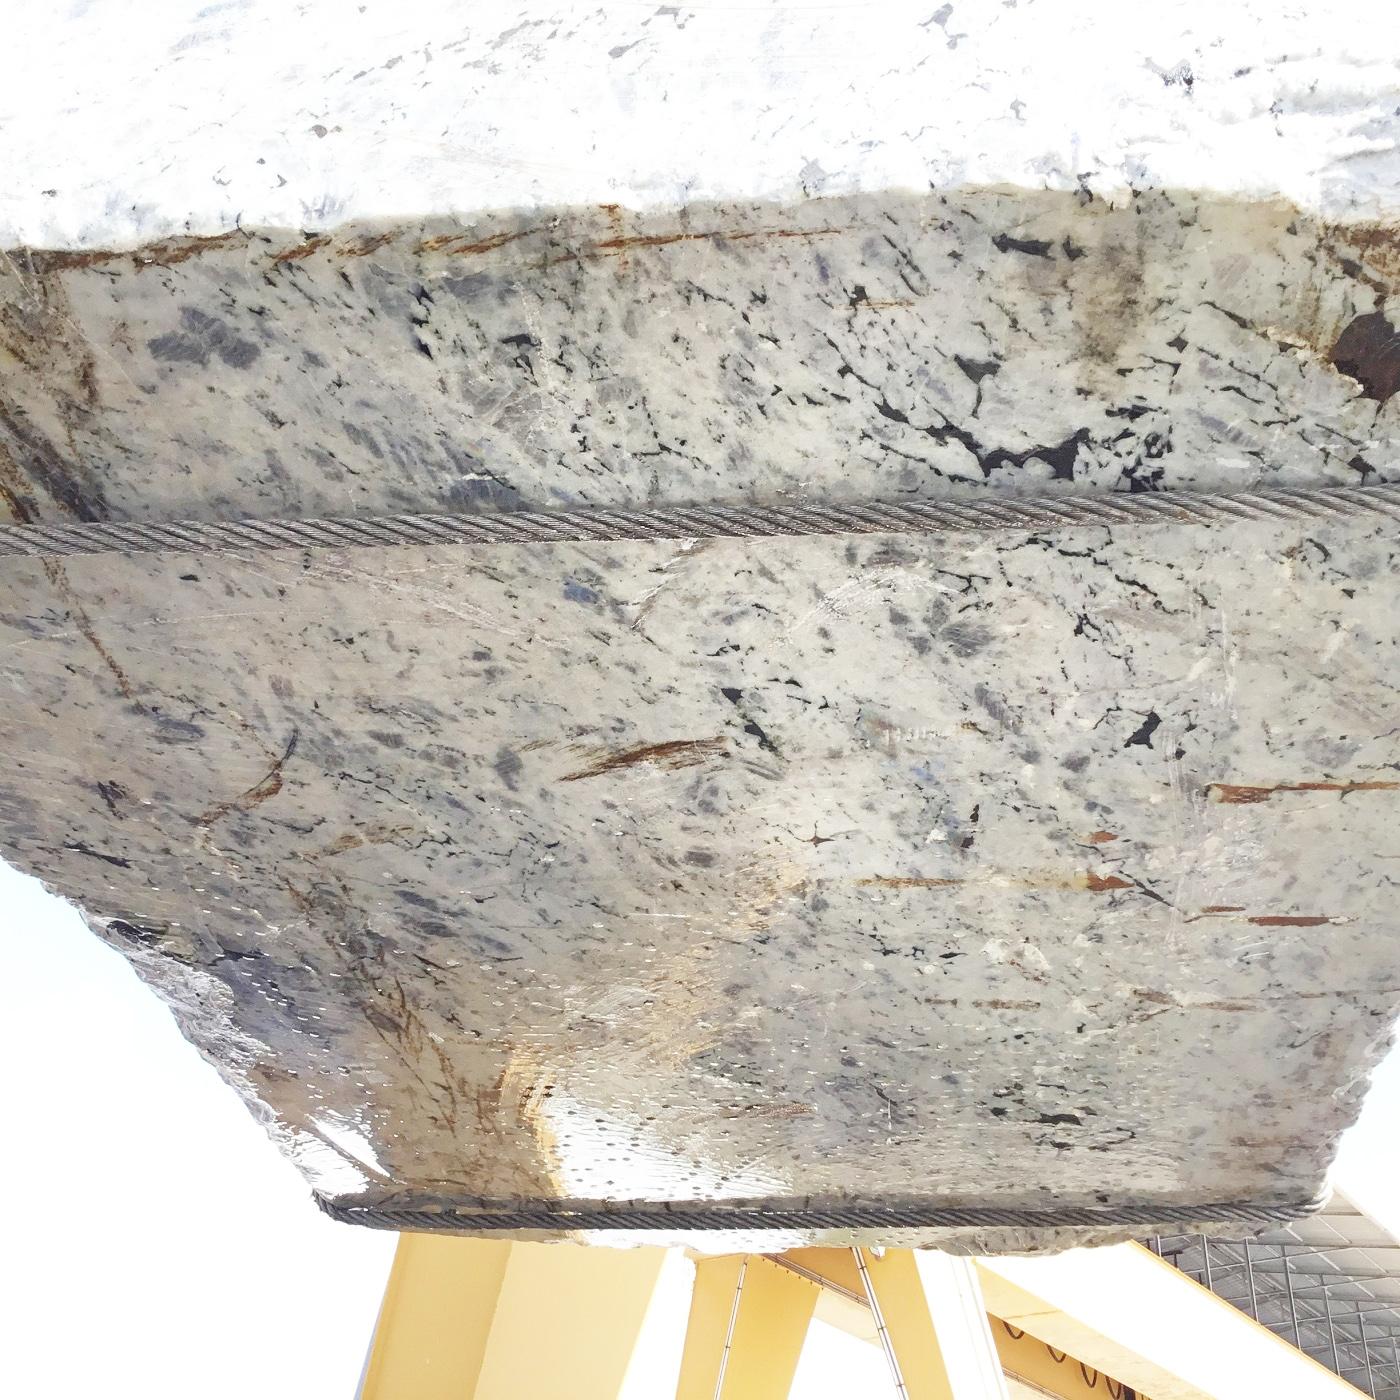 LABRADORITE BIANCA rough blocks GL D190308 , Face B natural labradorite